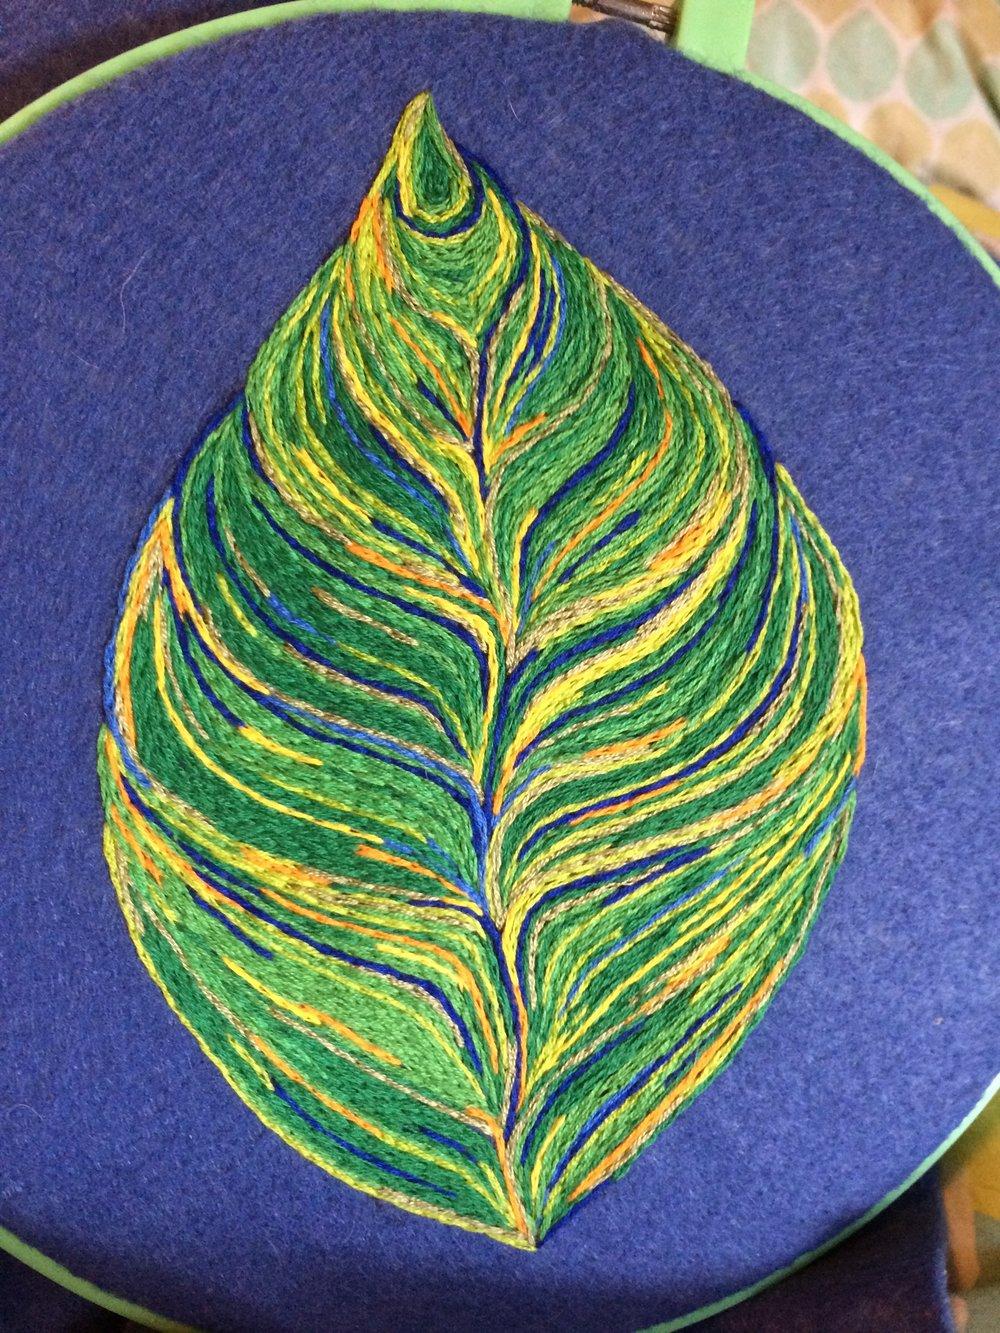 An embroidered leaf on felt.